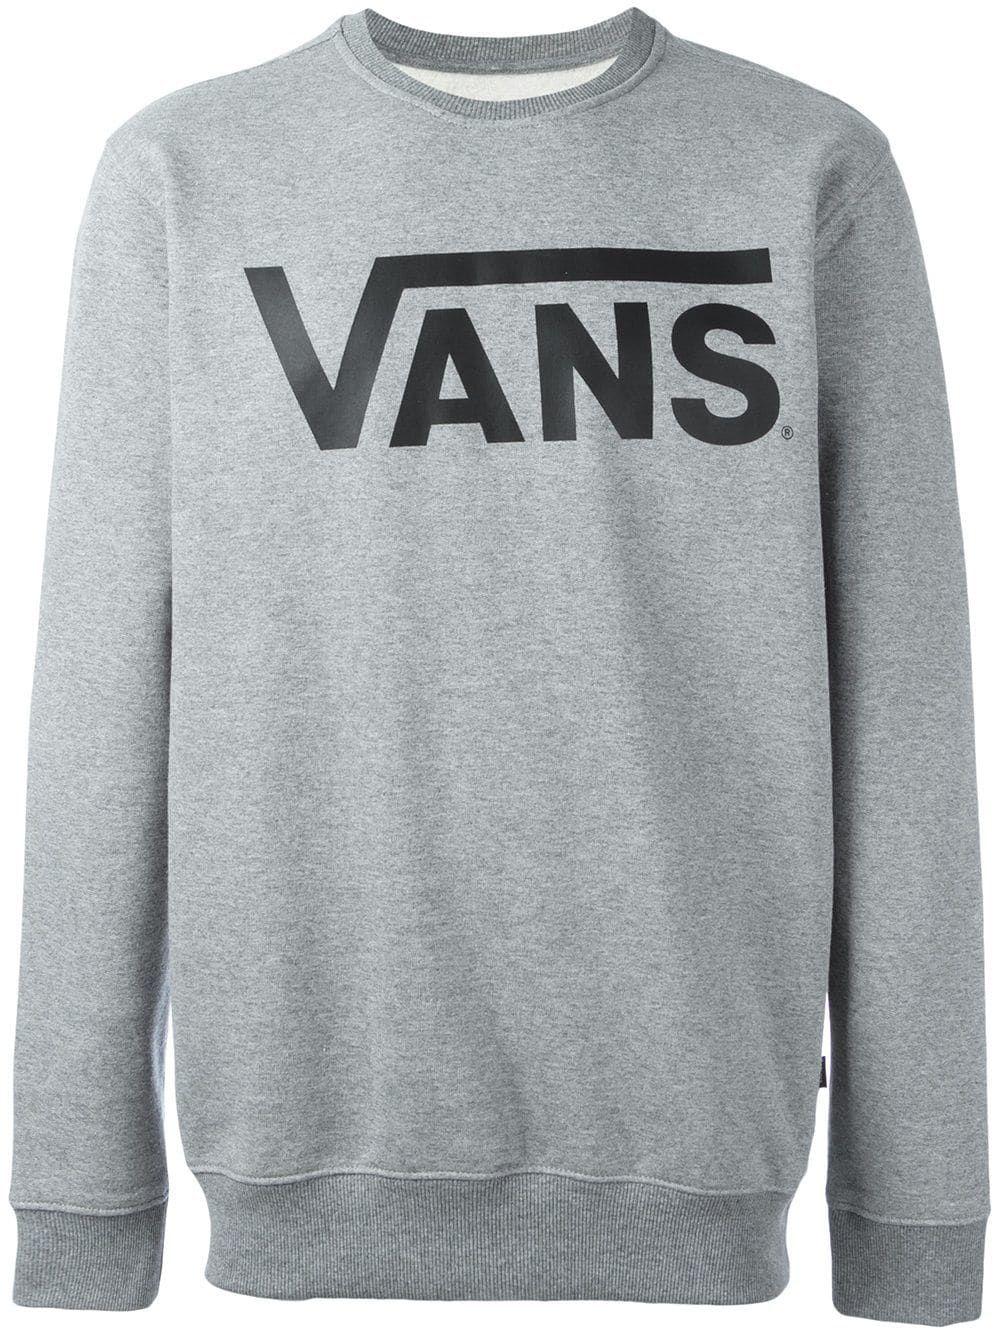 9ef985c2 VANS VANS LOGO PRINT SWEATSHIRT - GREY. #vans #cloth ...